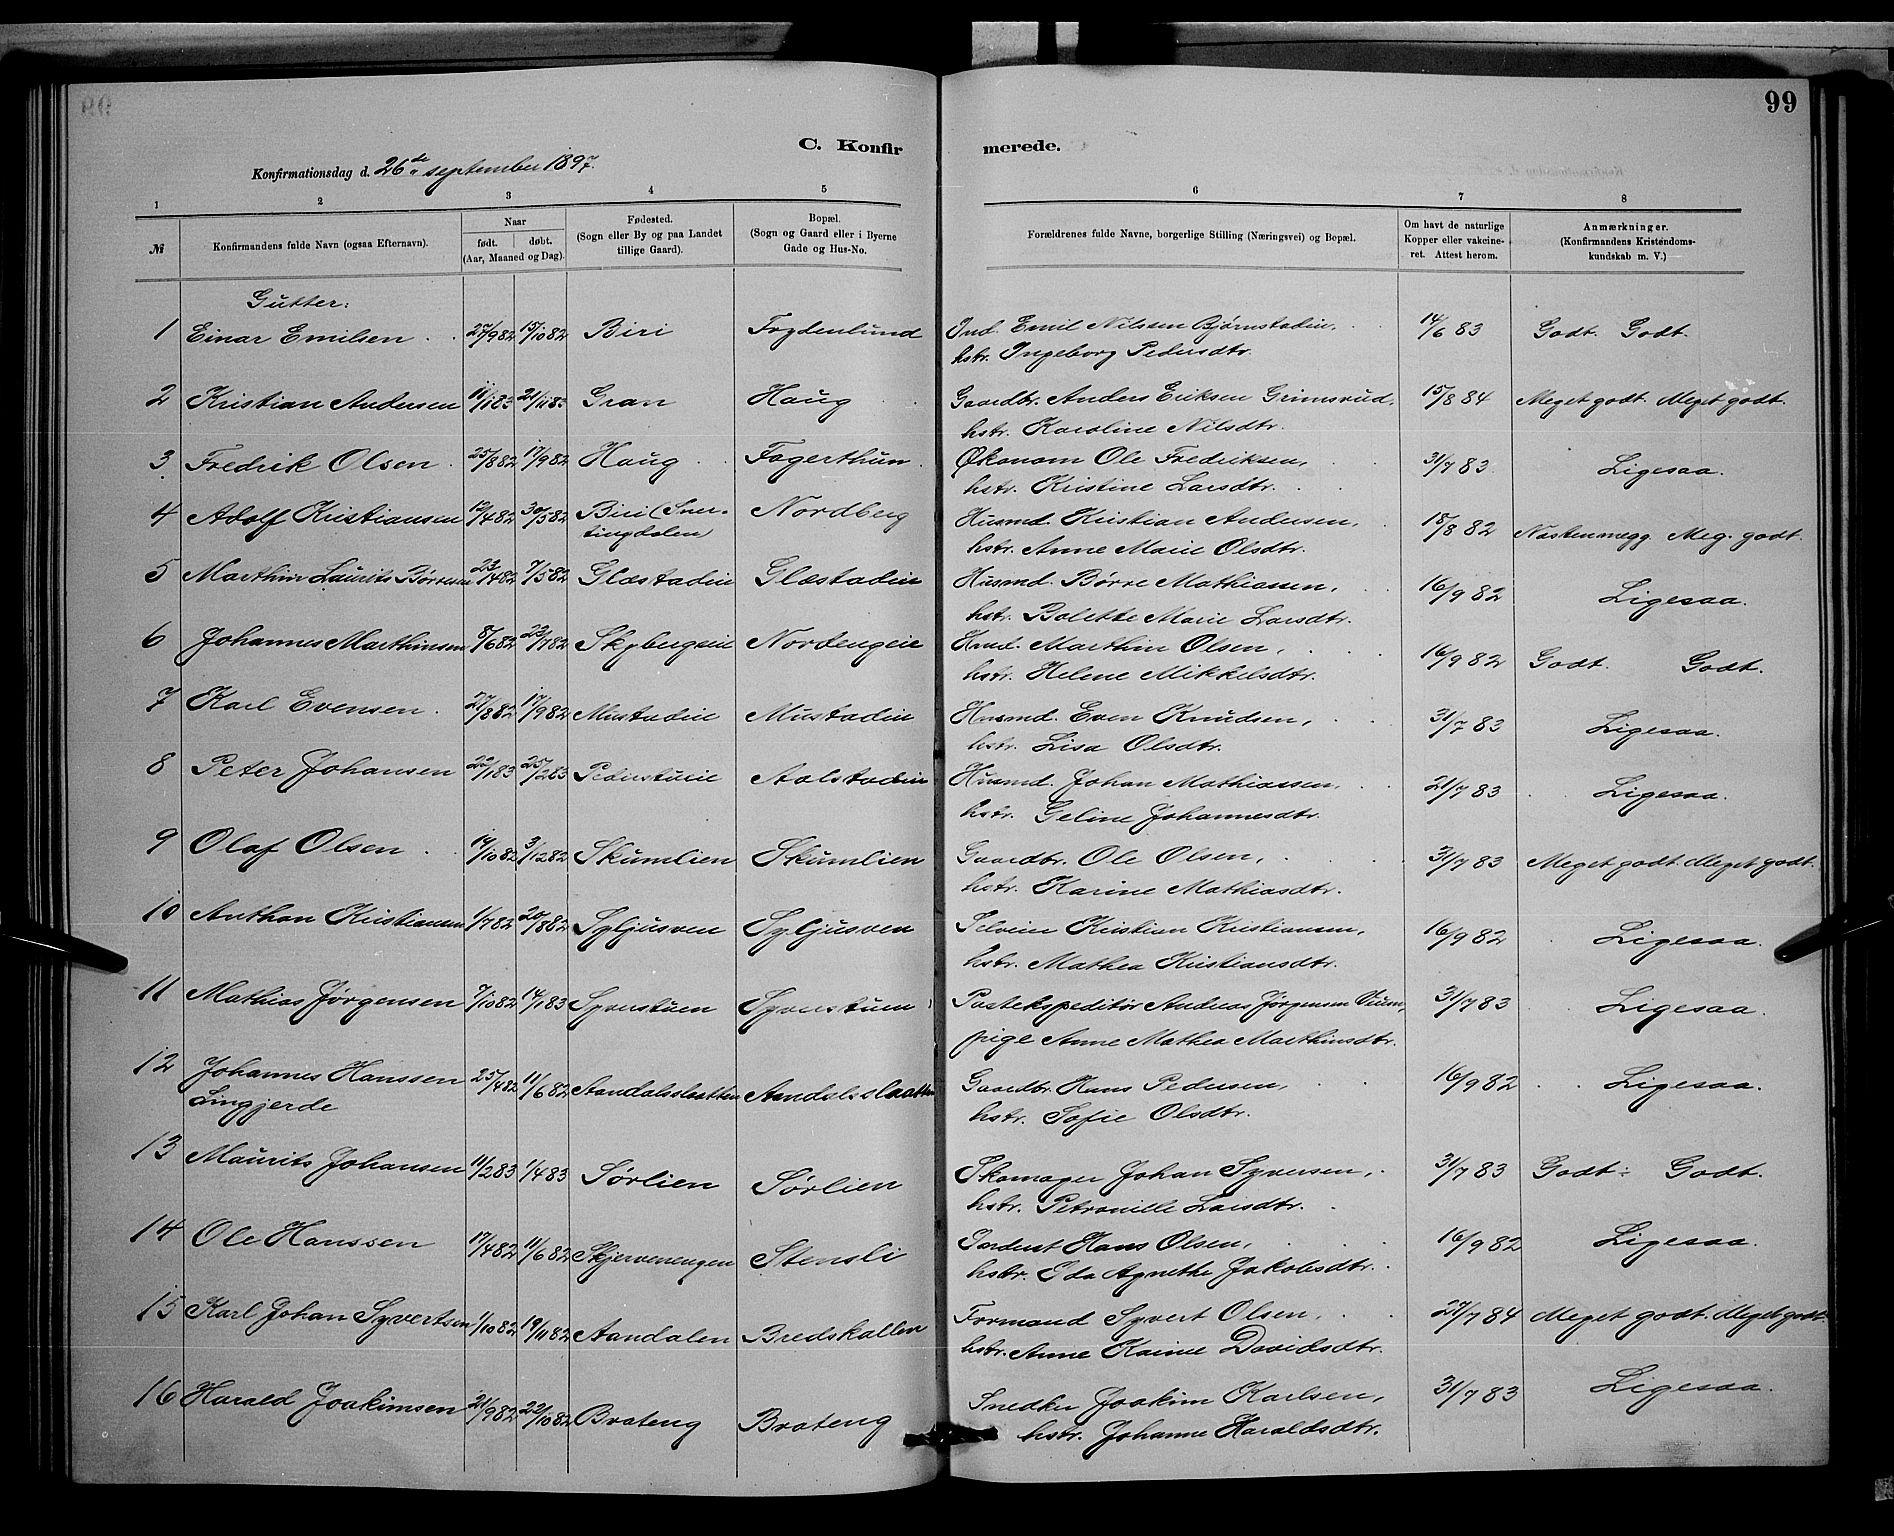 SAH, Vardal prestekontor, H/Ha/Hab/L0008: Klokkerbok nr. 8, 1881-1898, s. 99